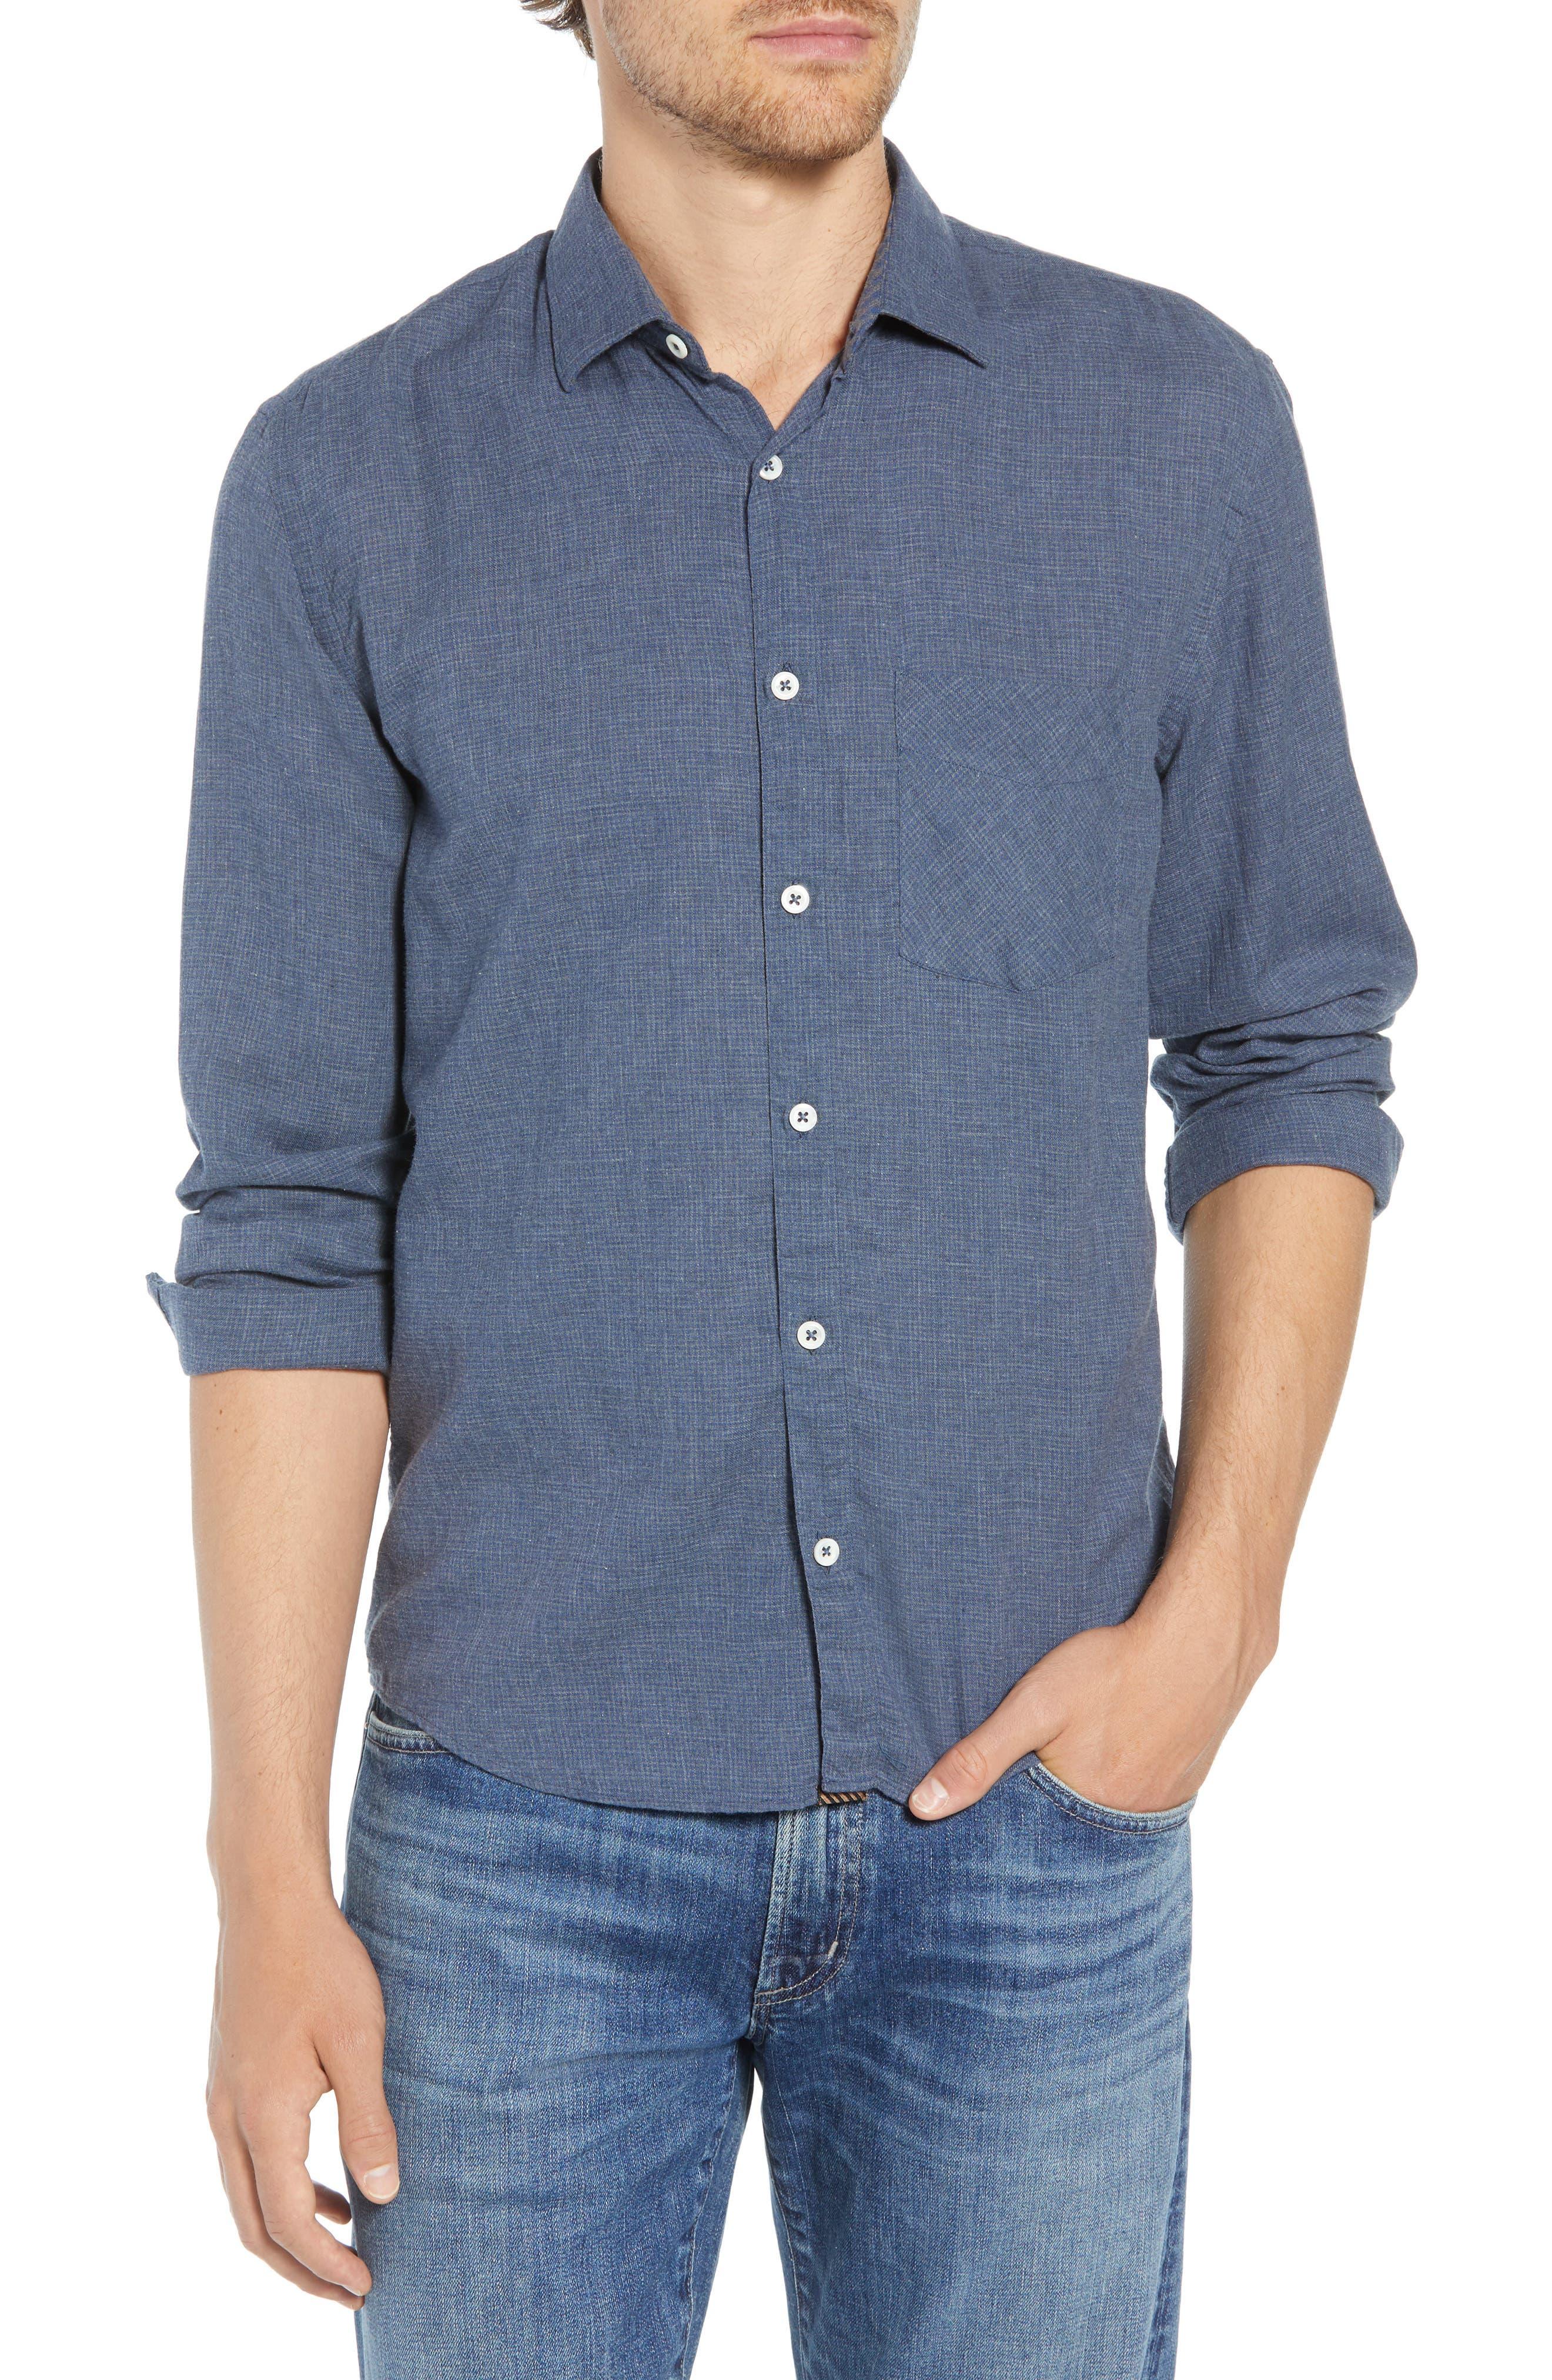 John Regular Fit Sport Shirt,                         Main,                         color, 420